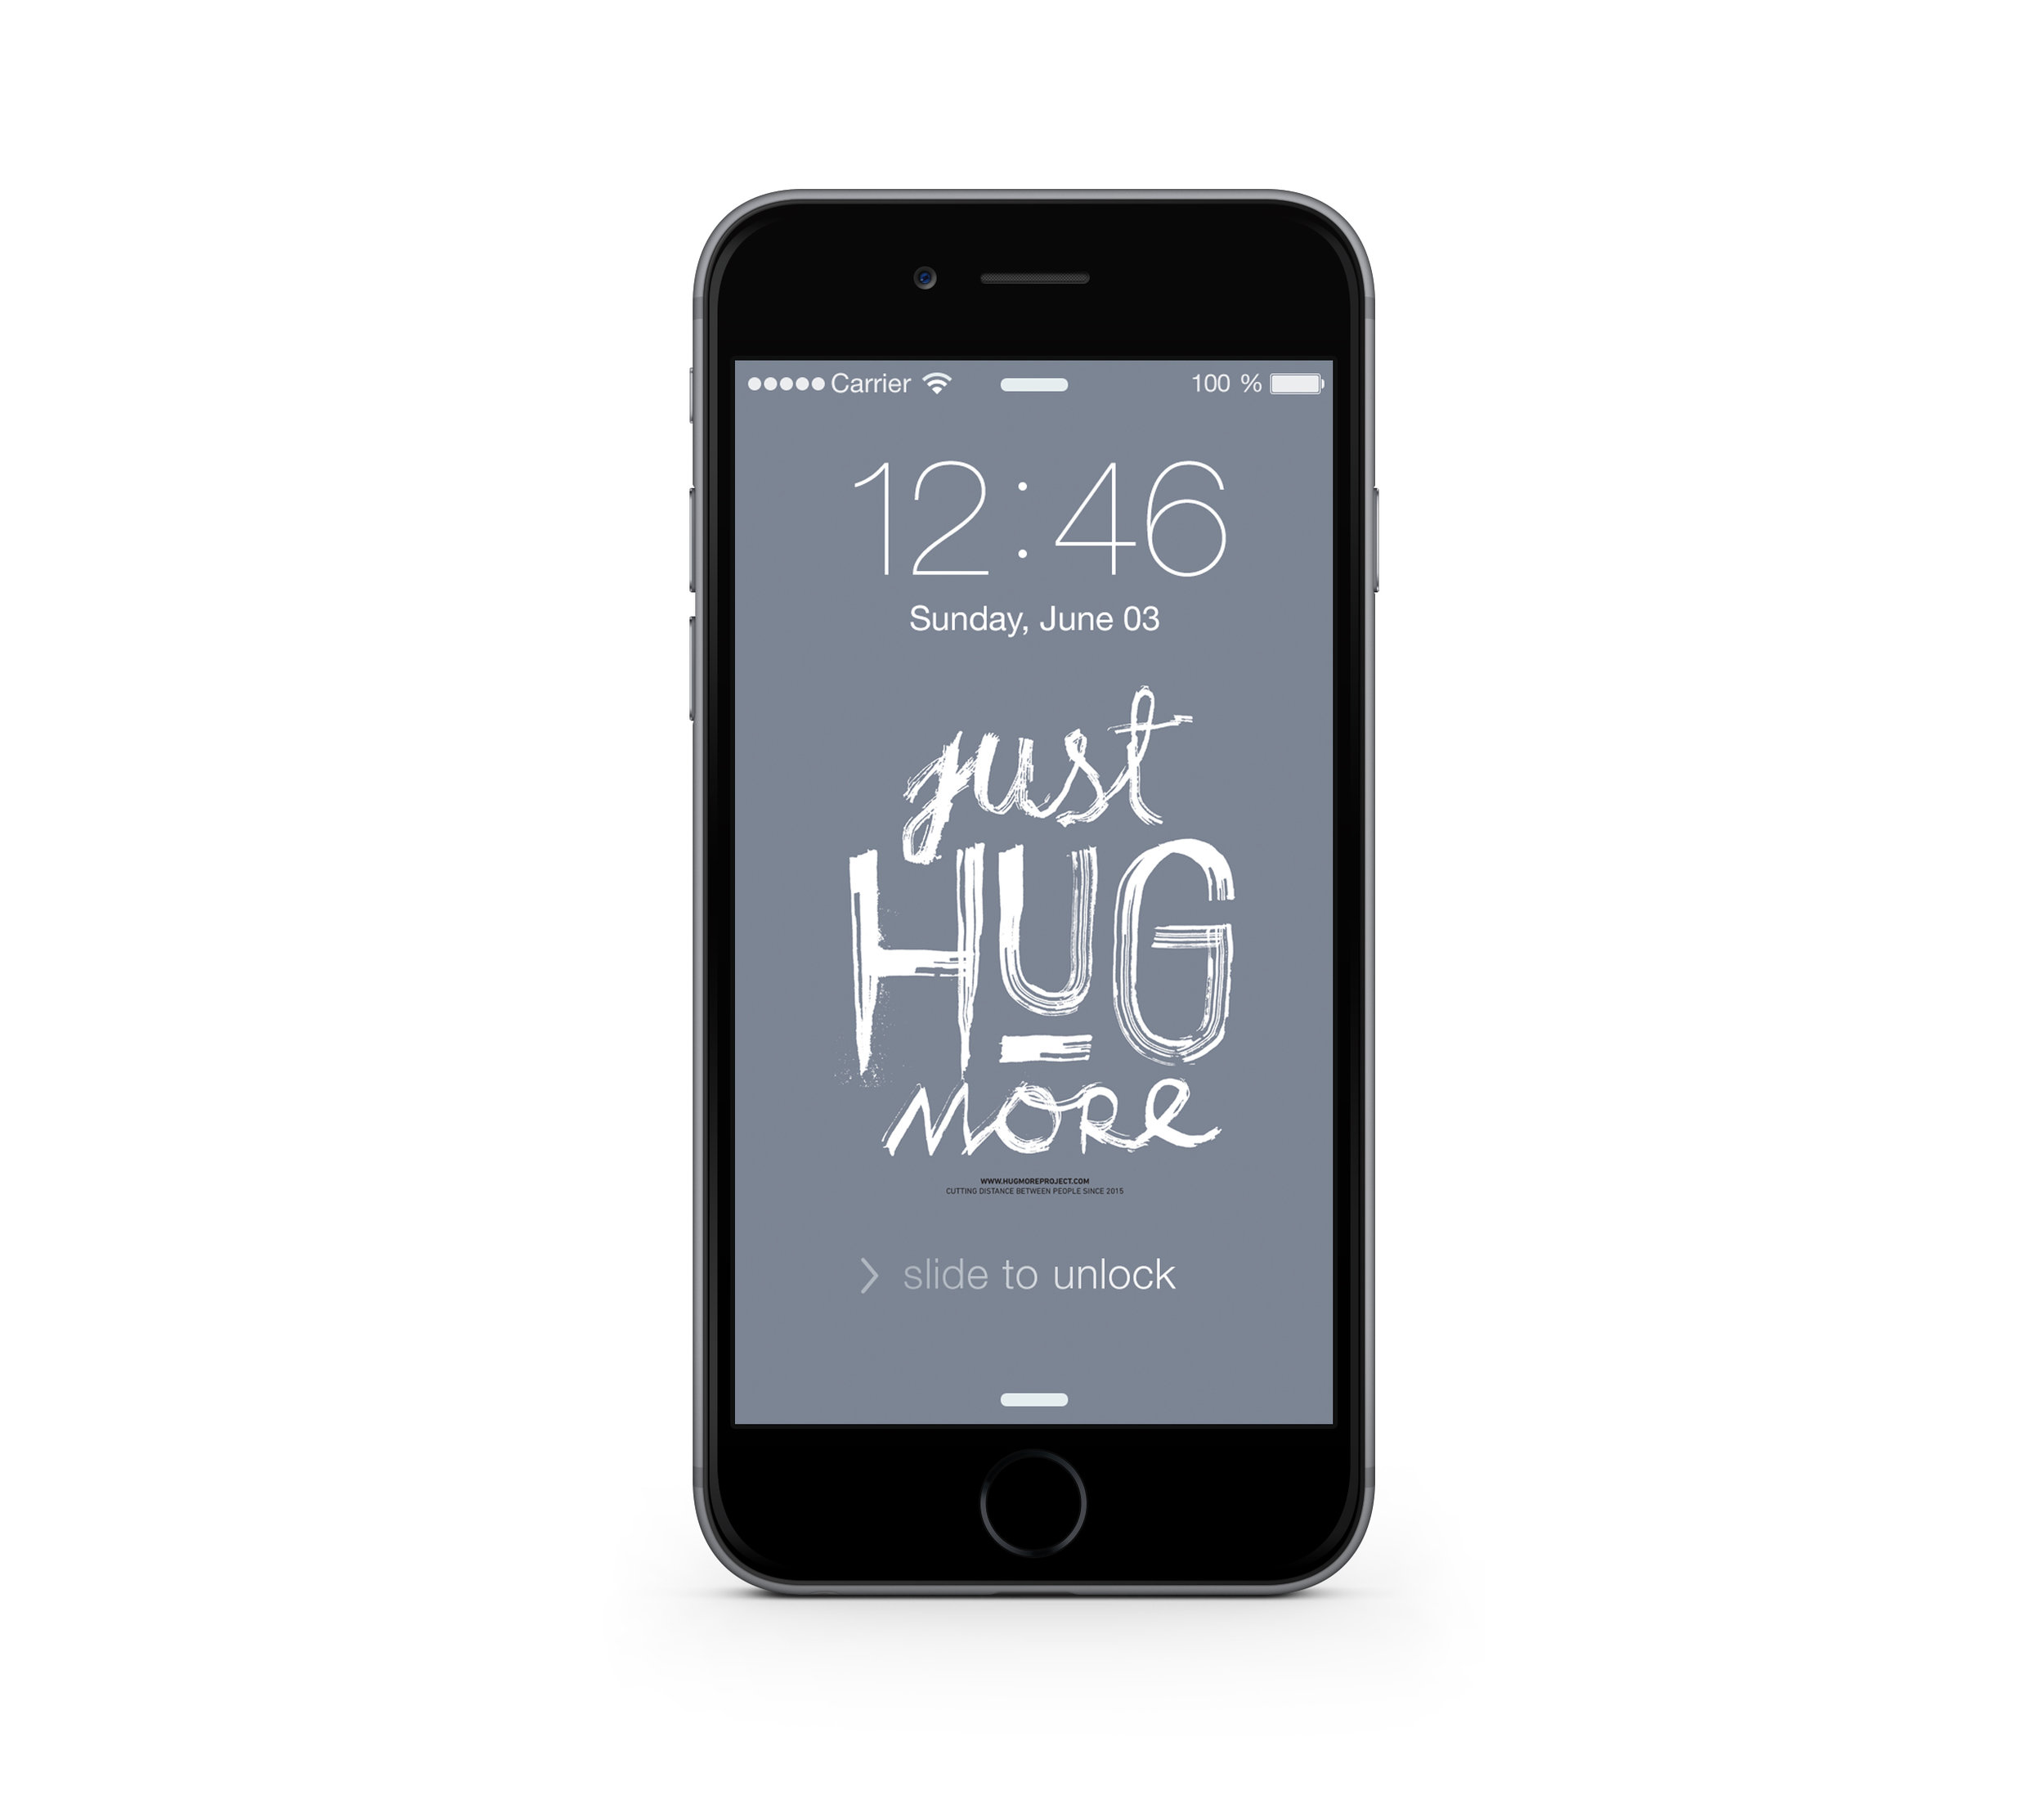 just-hug-more-typo-027-iPhone-mockup-onwhite.jpg